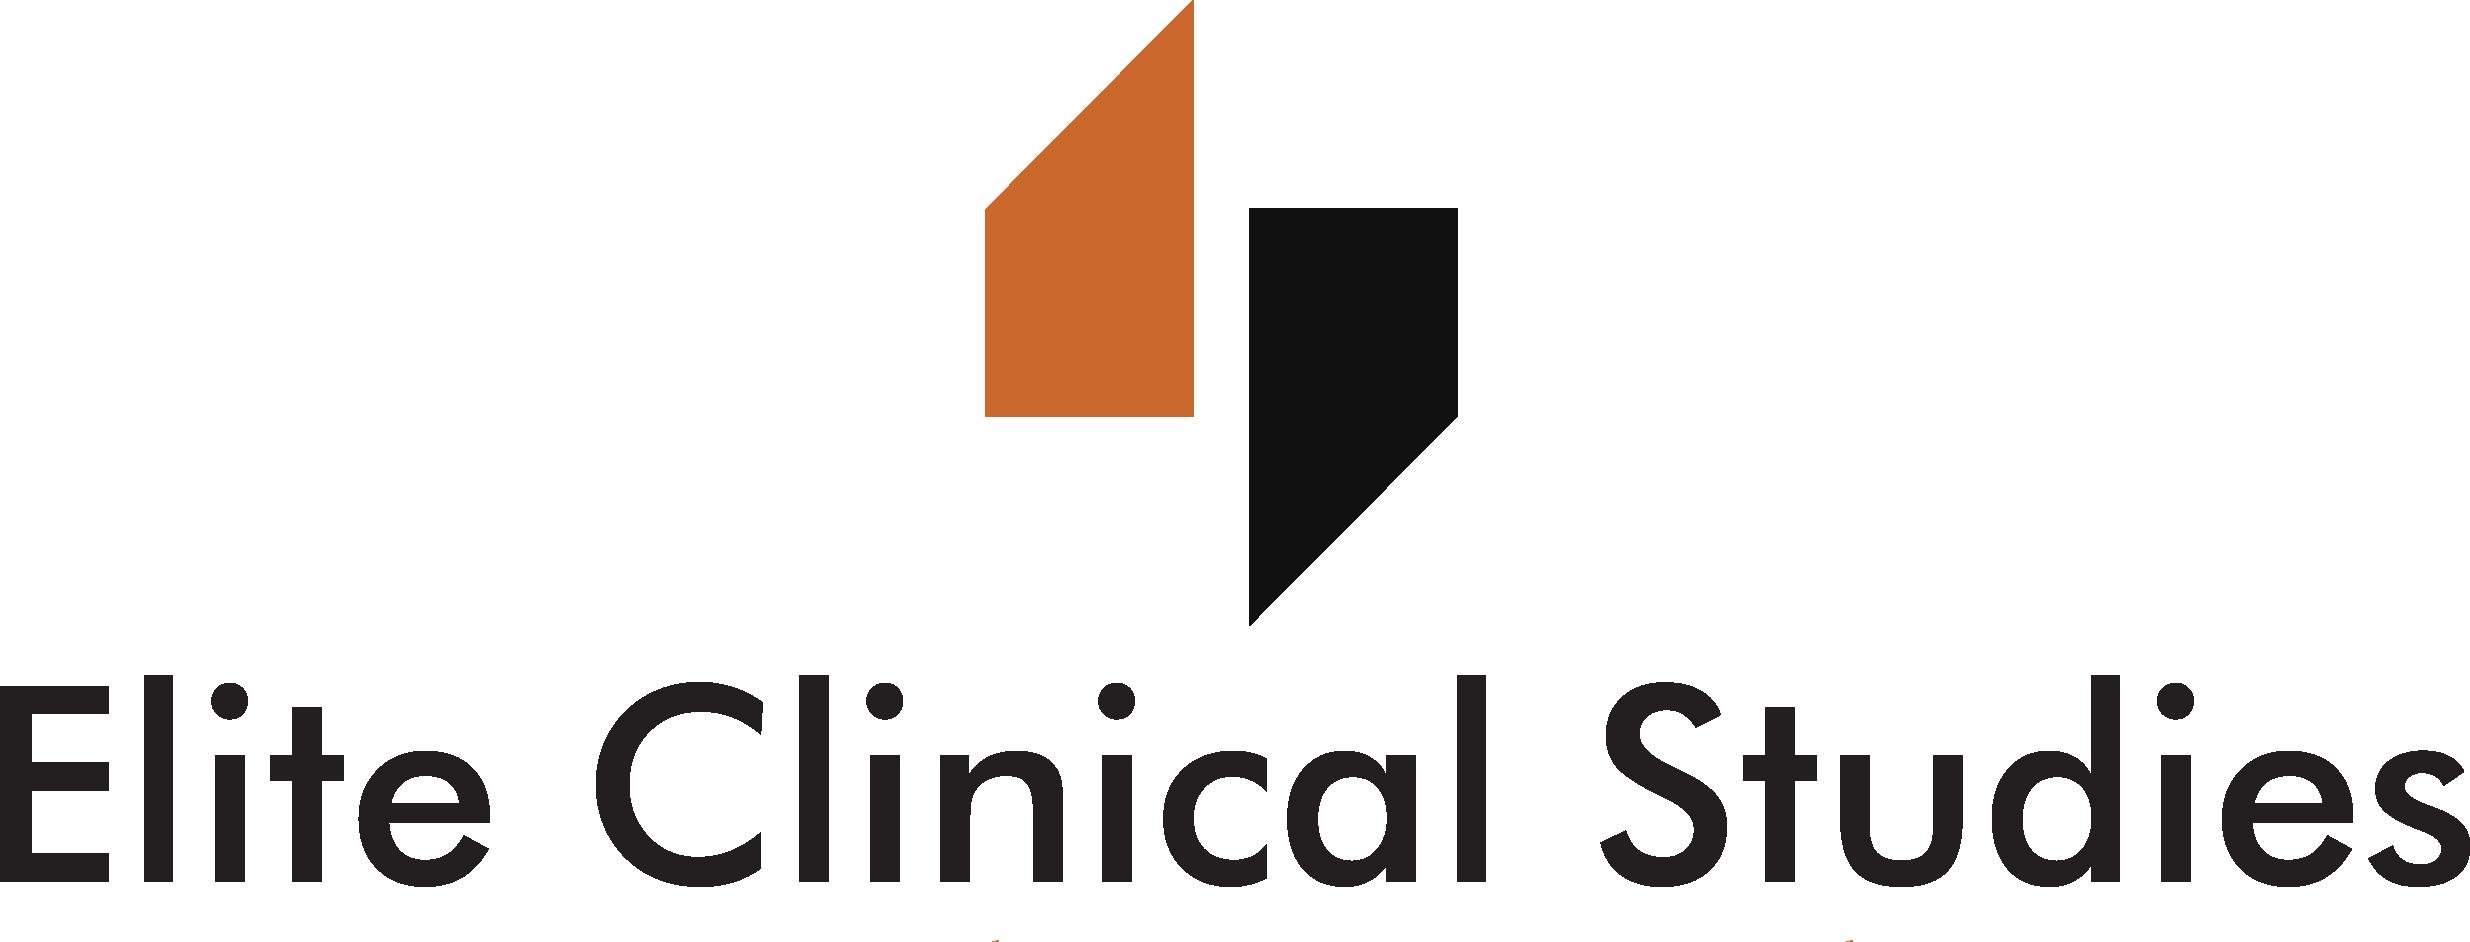 Elite Clinical Studies, LLC